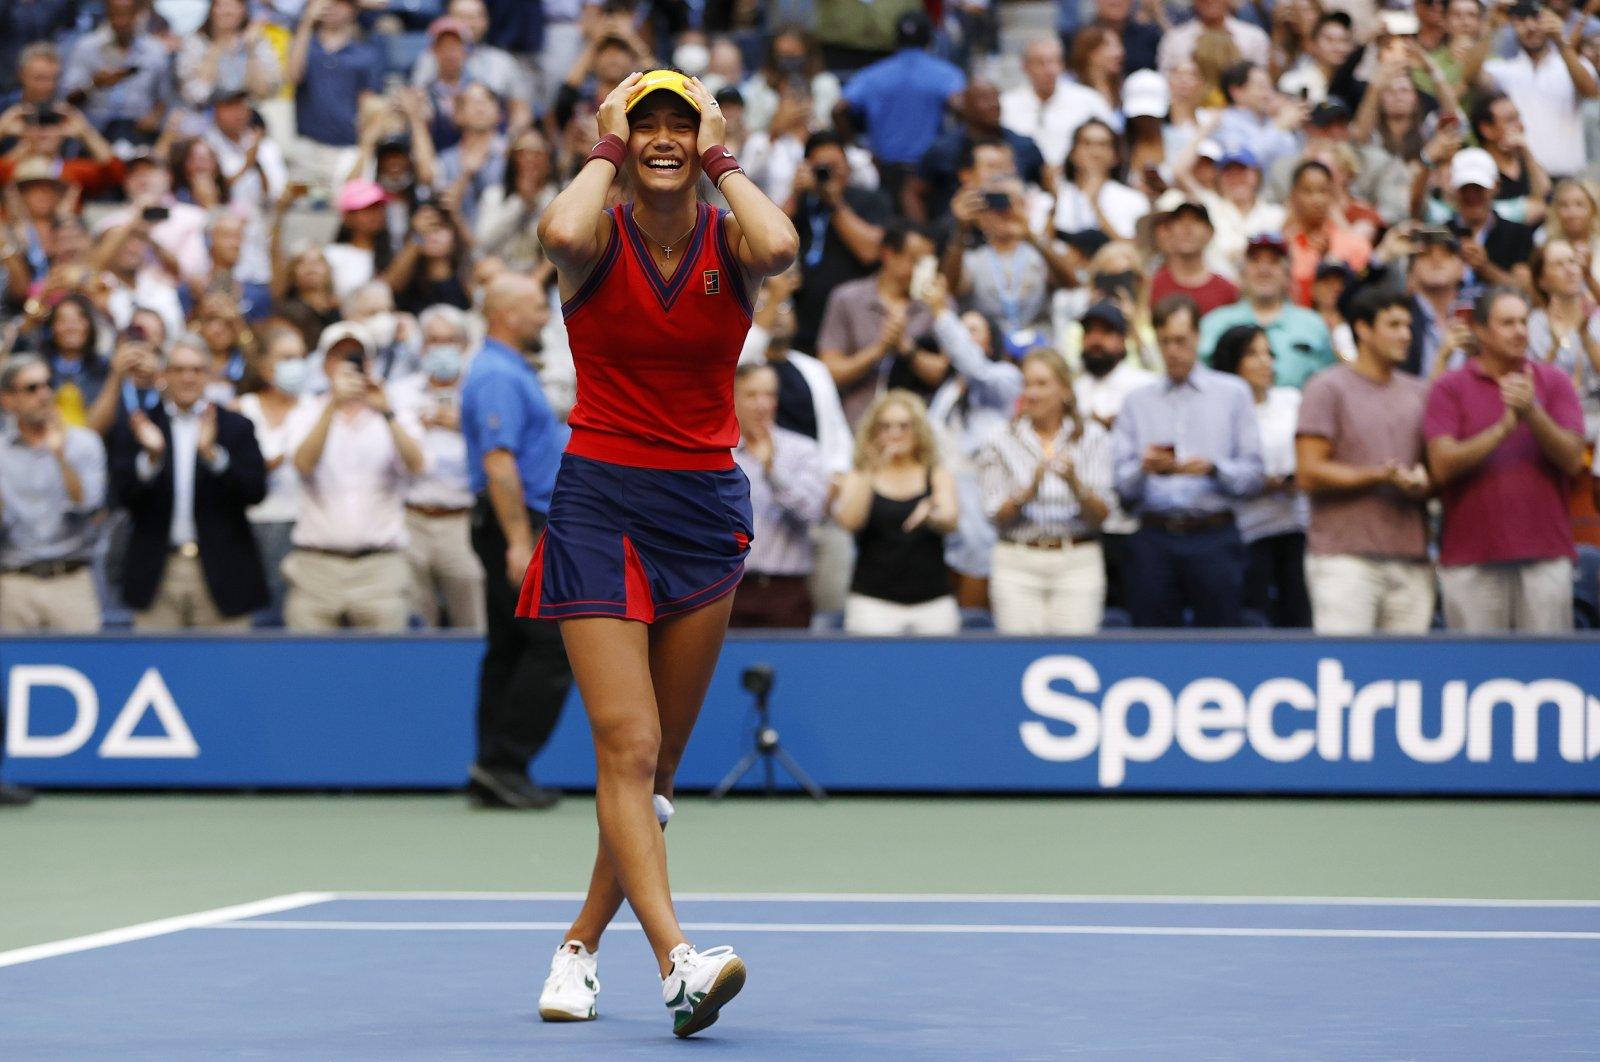 Britain's Emma Raducanu reacts after winning the U.S. Open women's singles final against Canada's Leylah Fernandez, New York, Sept. 12, 2021. (AA Photo)